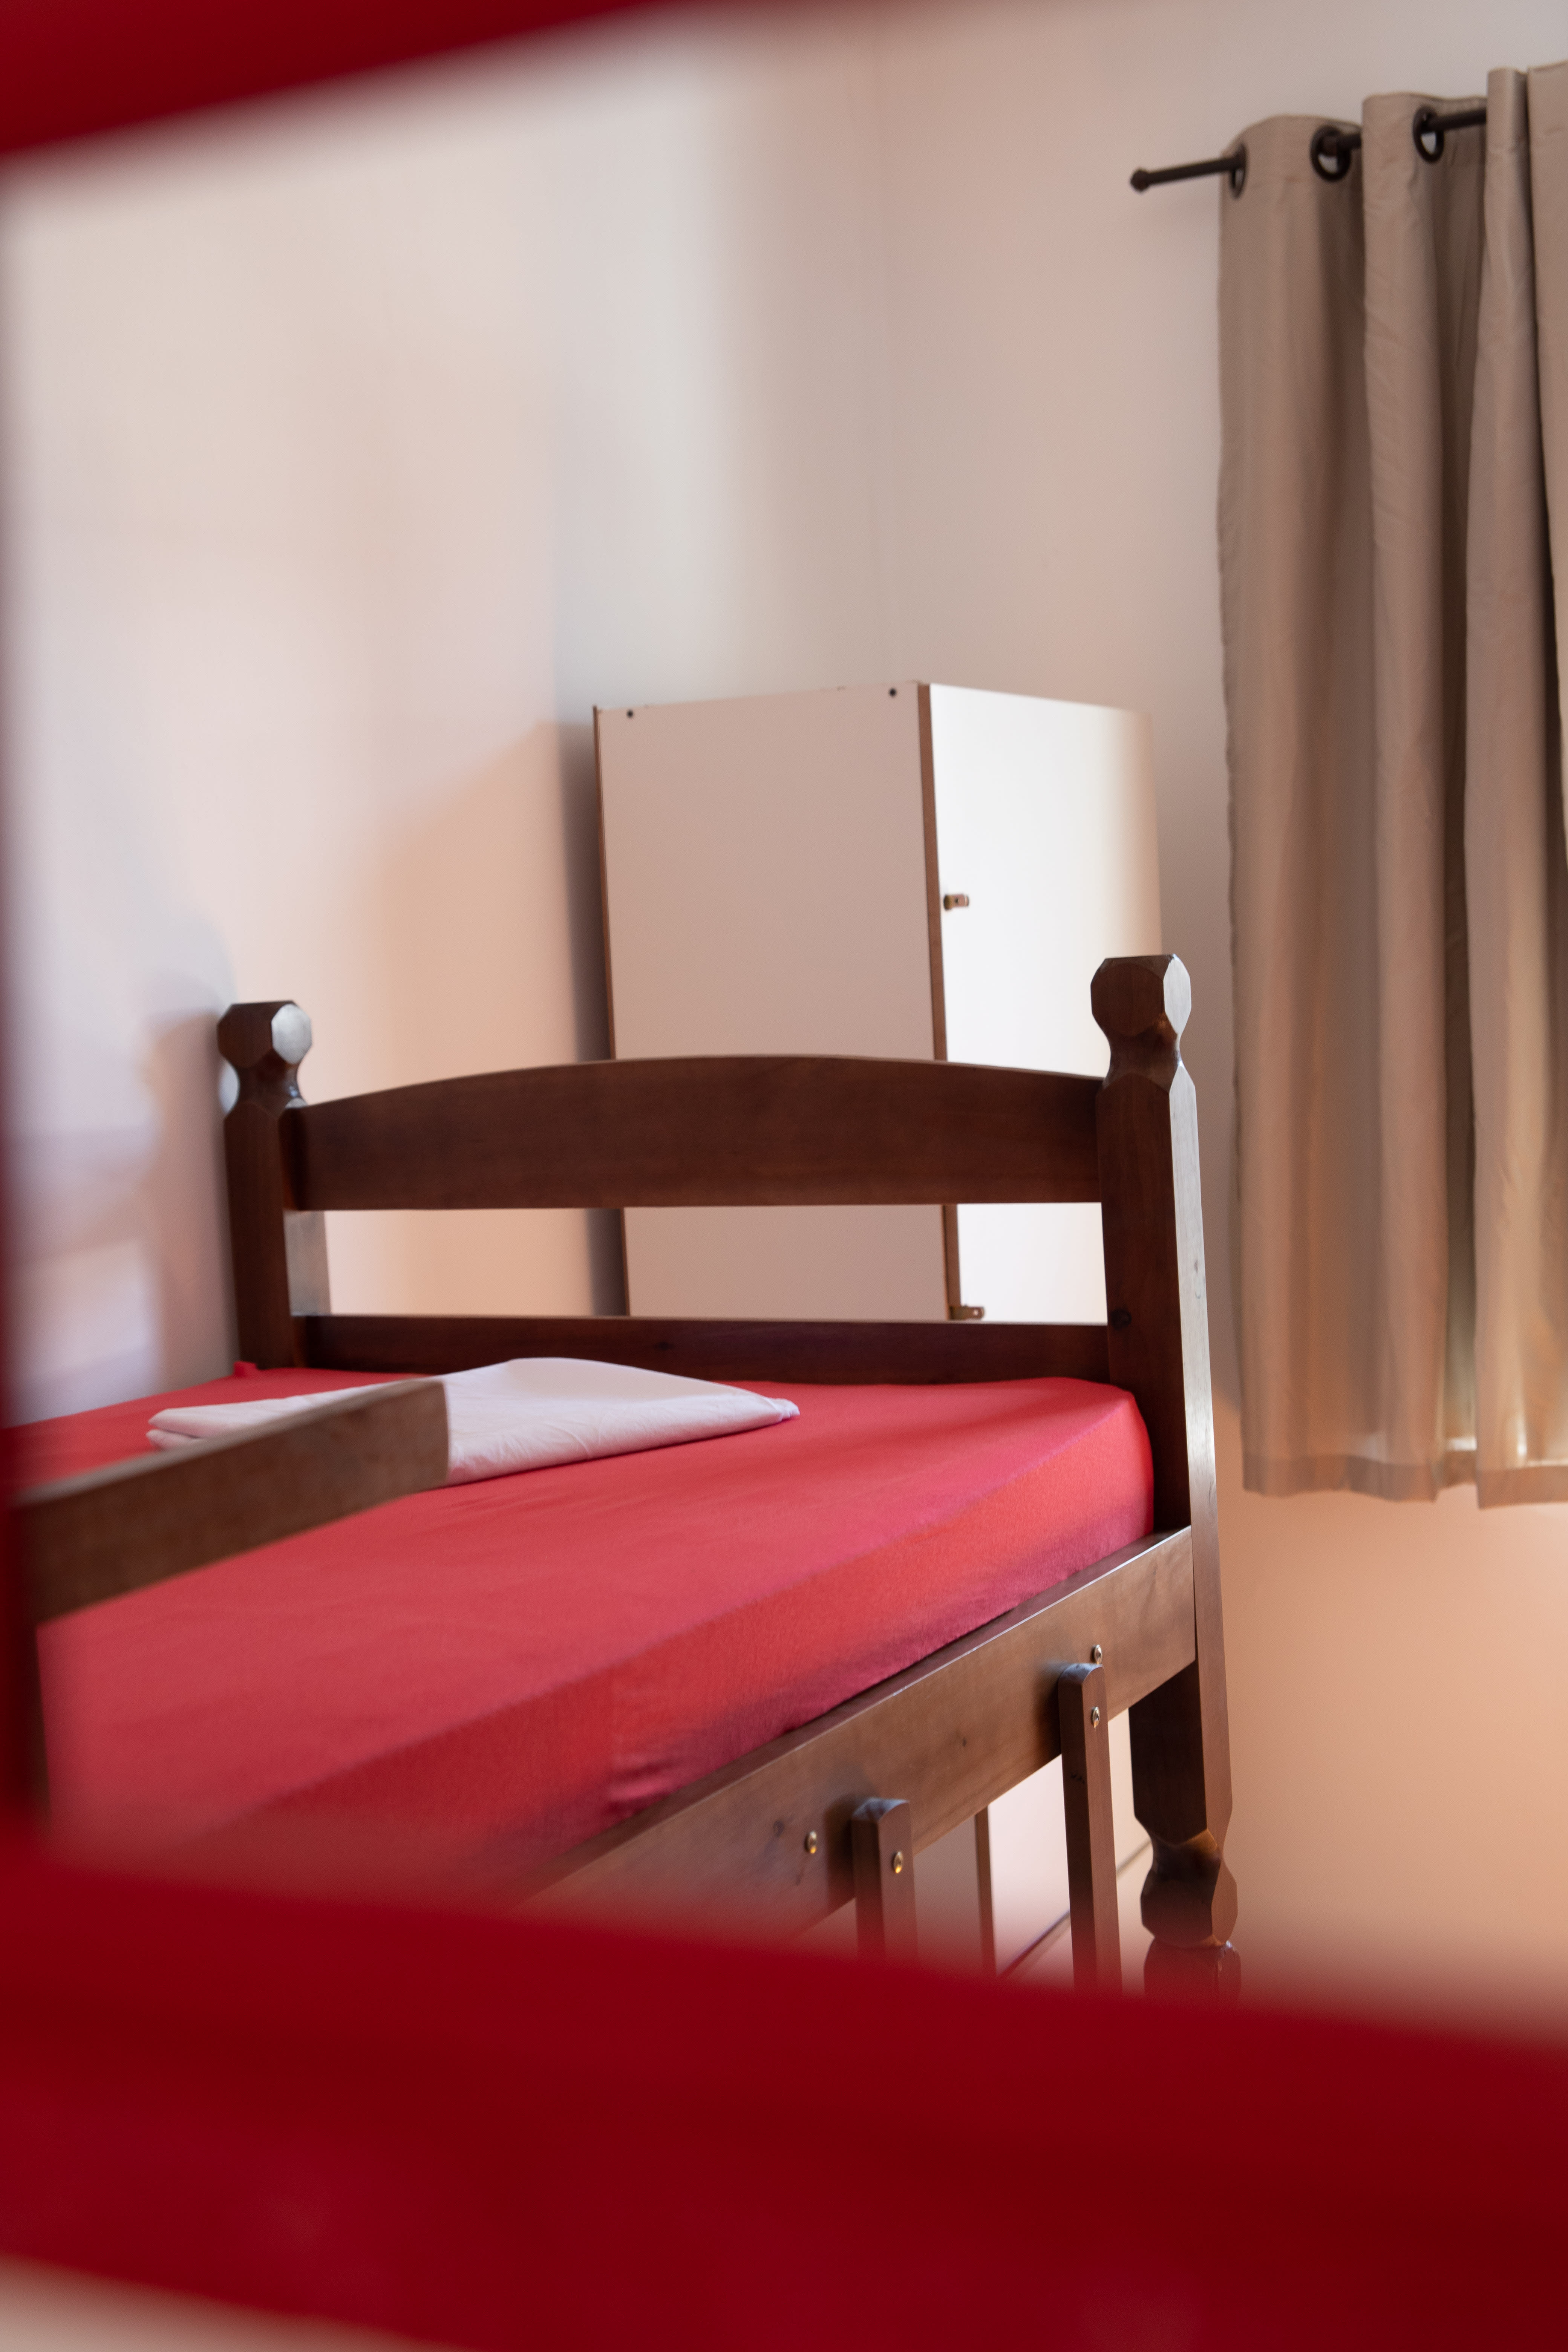 HOSTEL - Hostel Calábria Vila Madalena